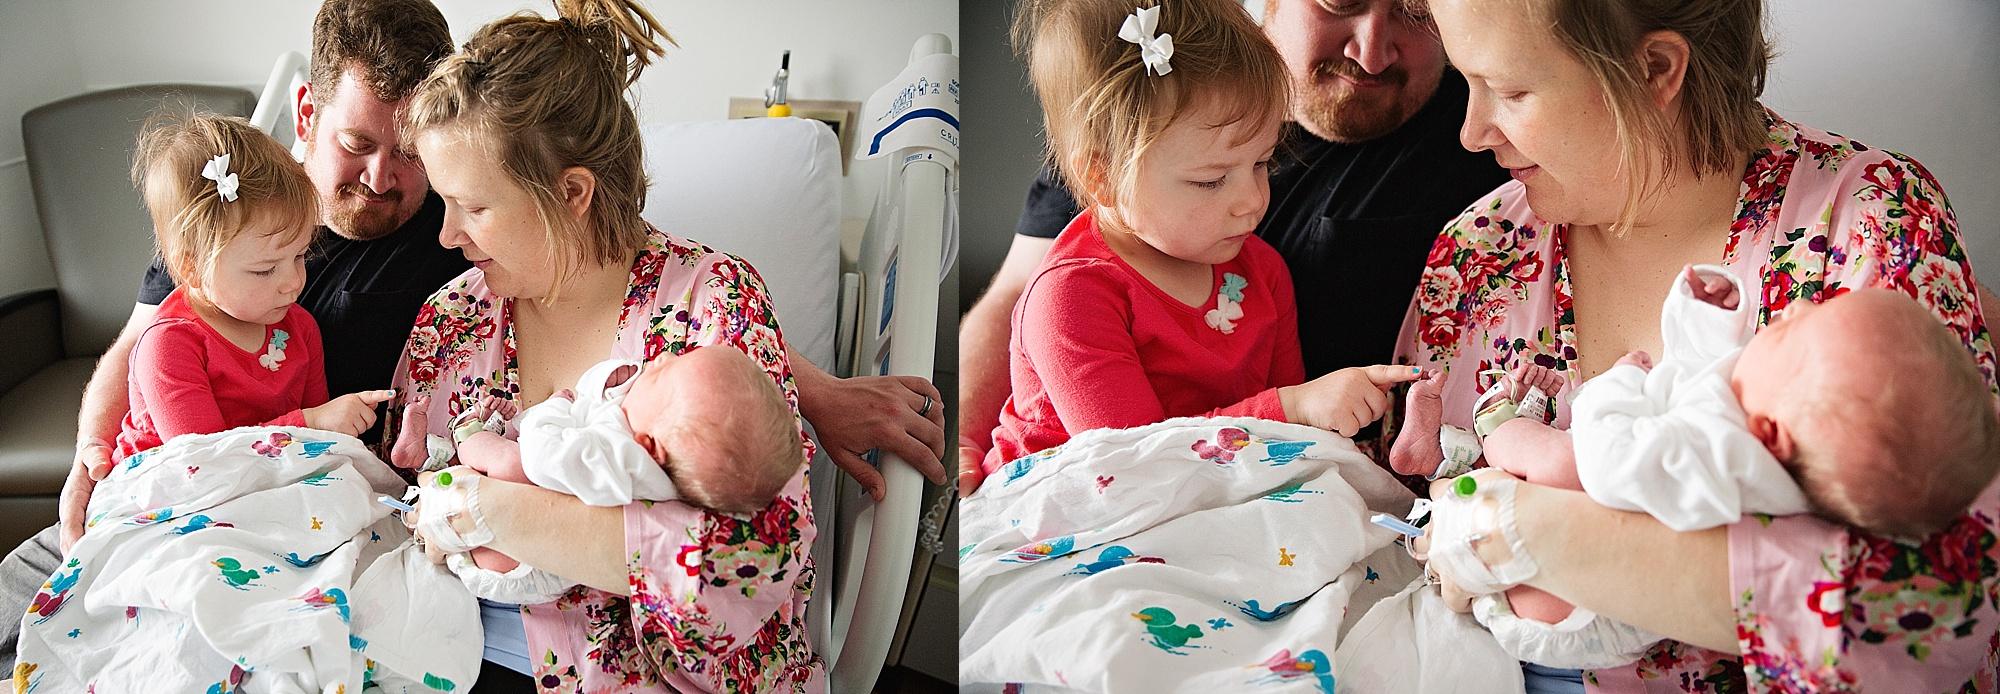 lauren-grayson-photography-akron-ohio-photographer-family-newborn-fresh-48-baby-hospital-photo-shoot-cleveland-clinic-akron-general-carter_0330.jpg